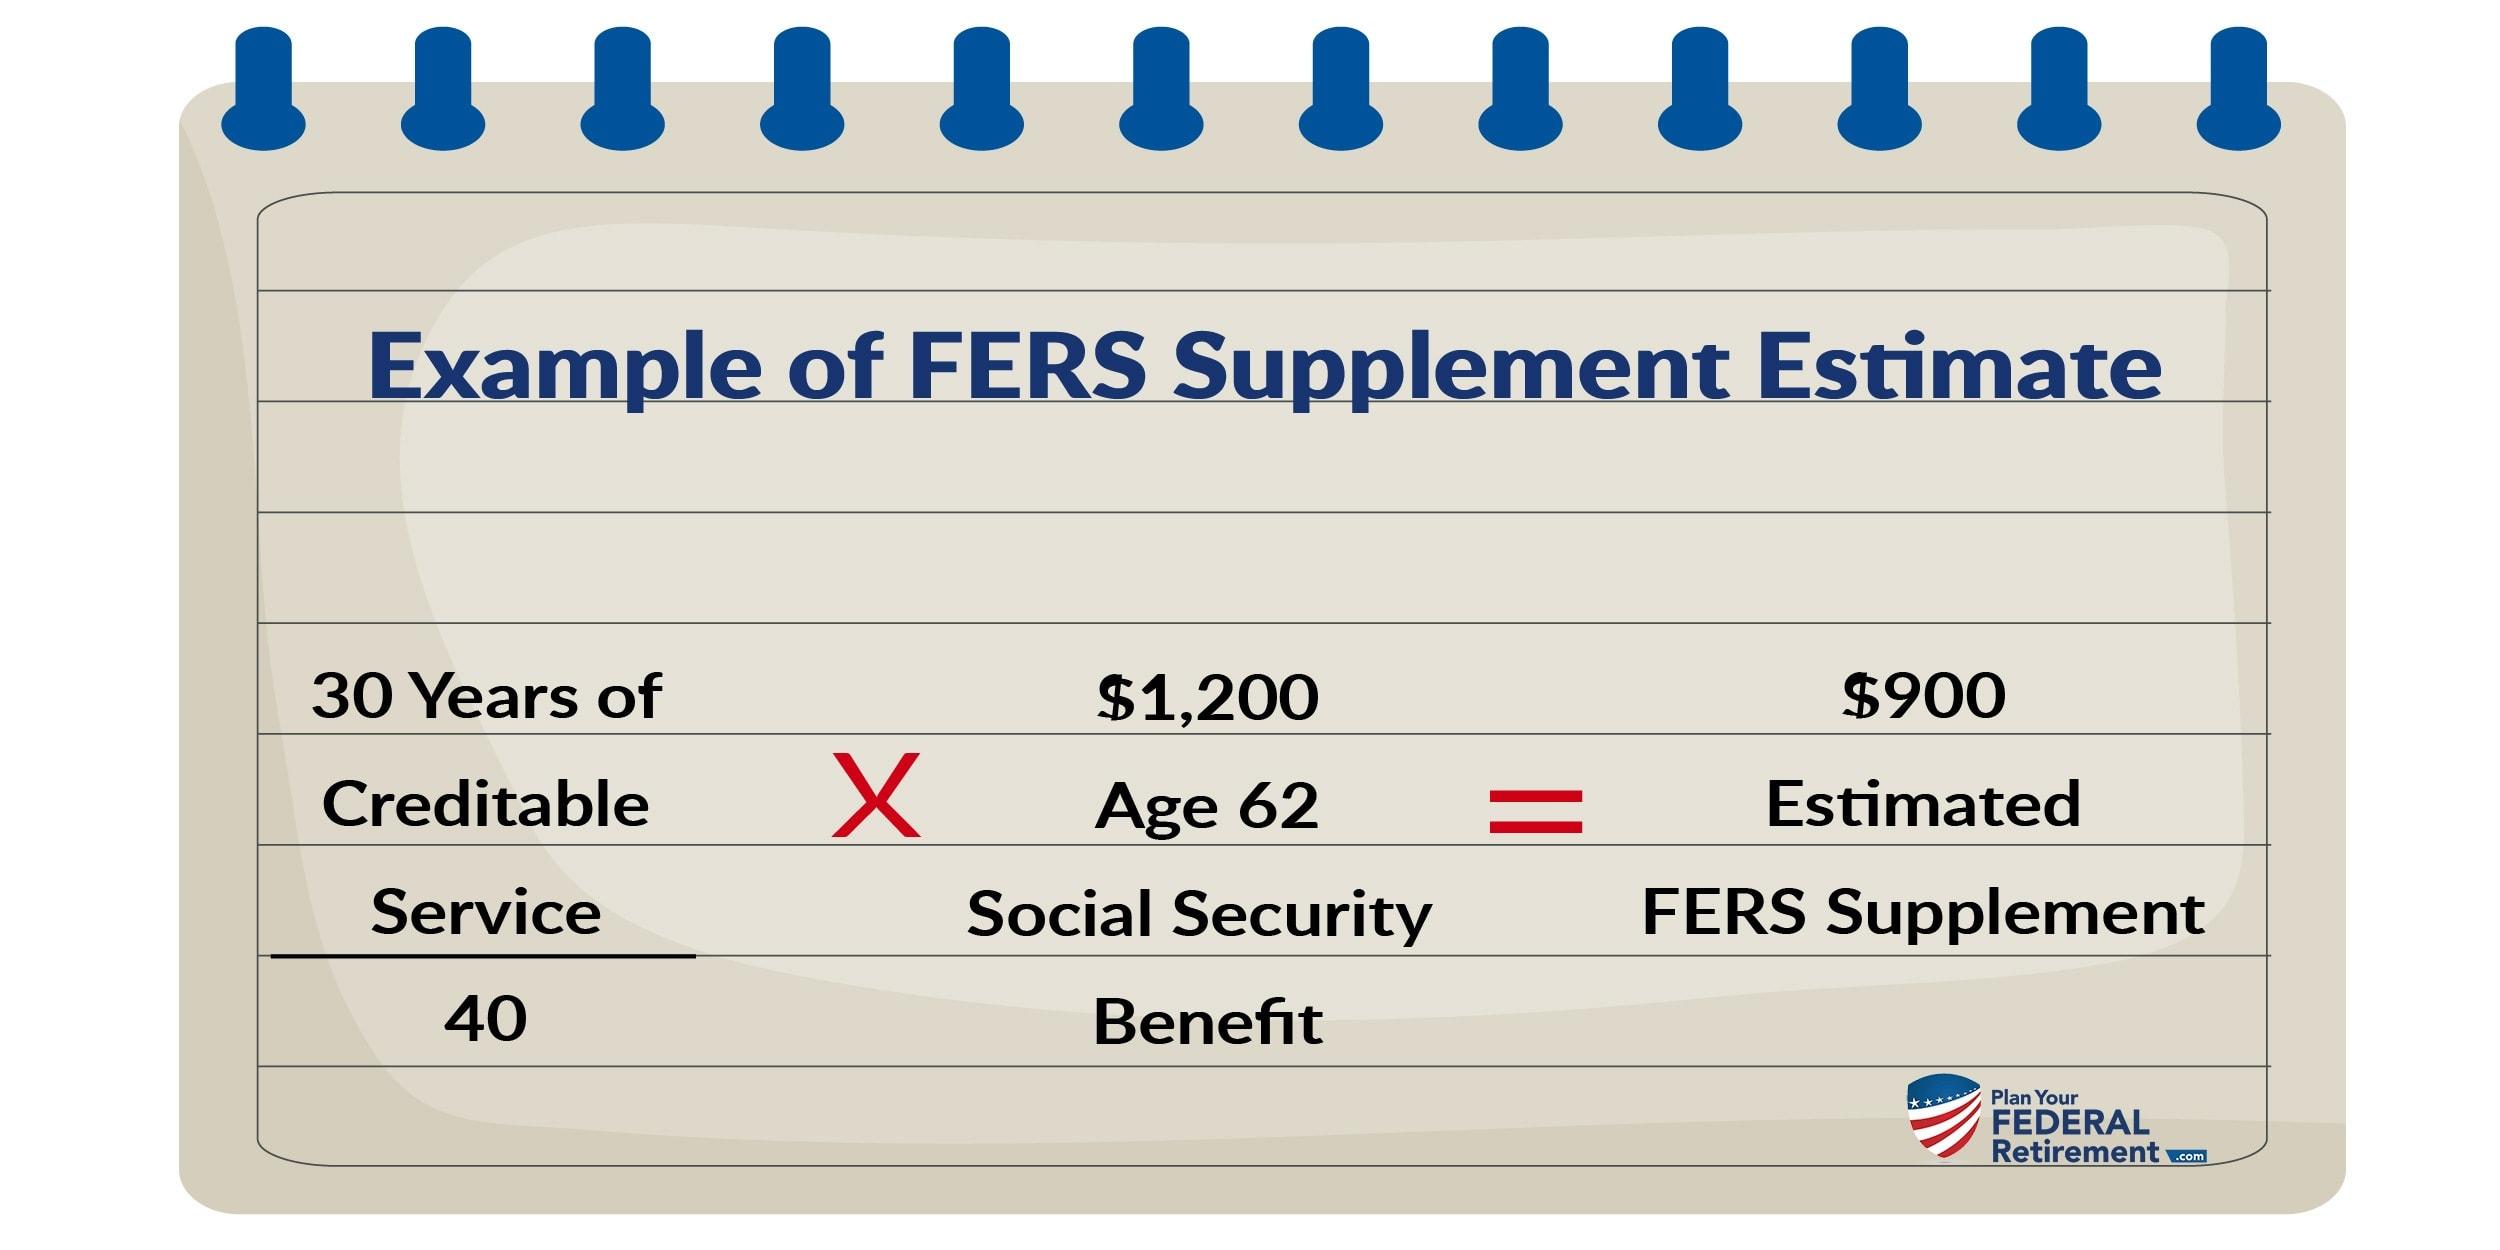 Case study: FERS Supplement calculation